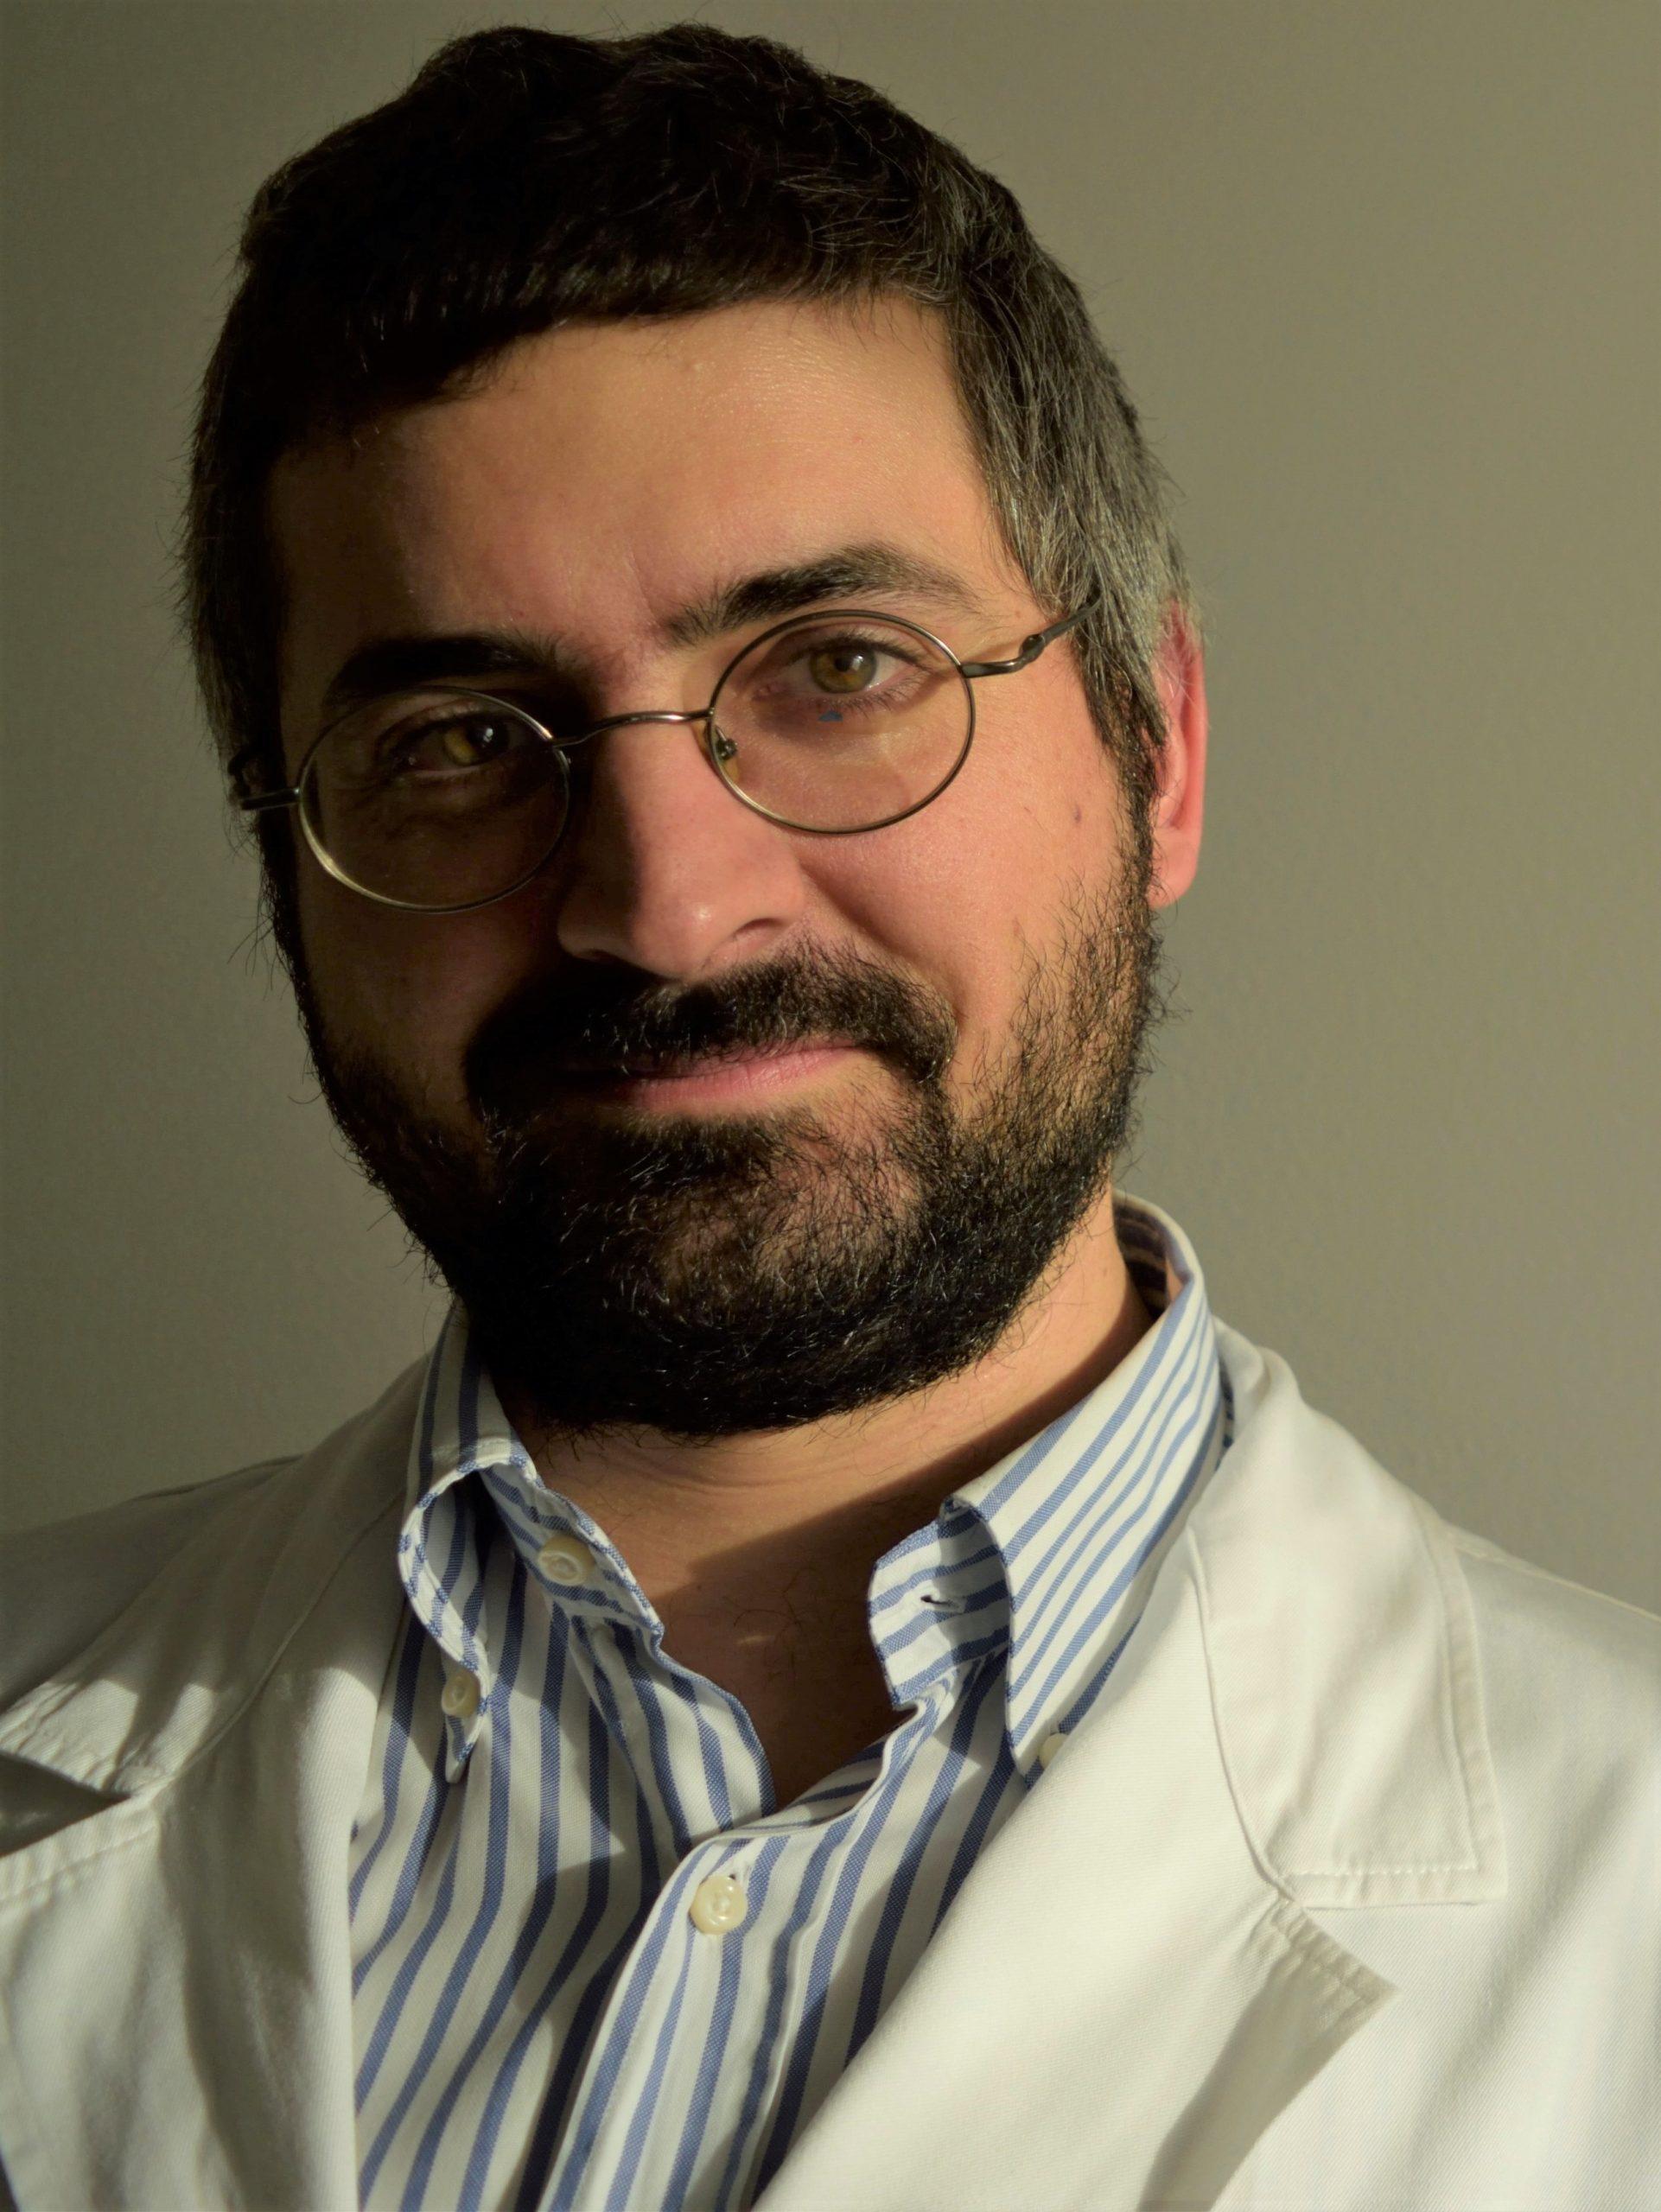 Dr Marco Solmi